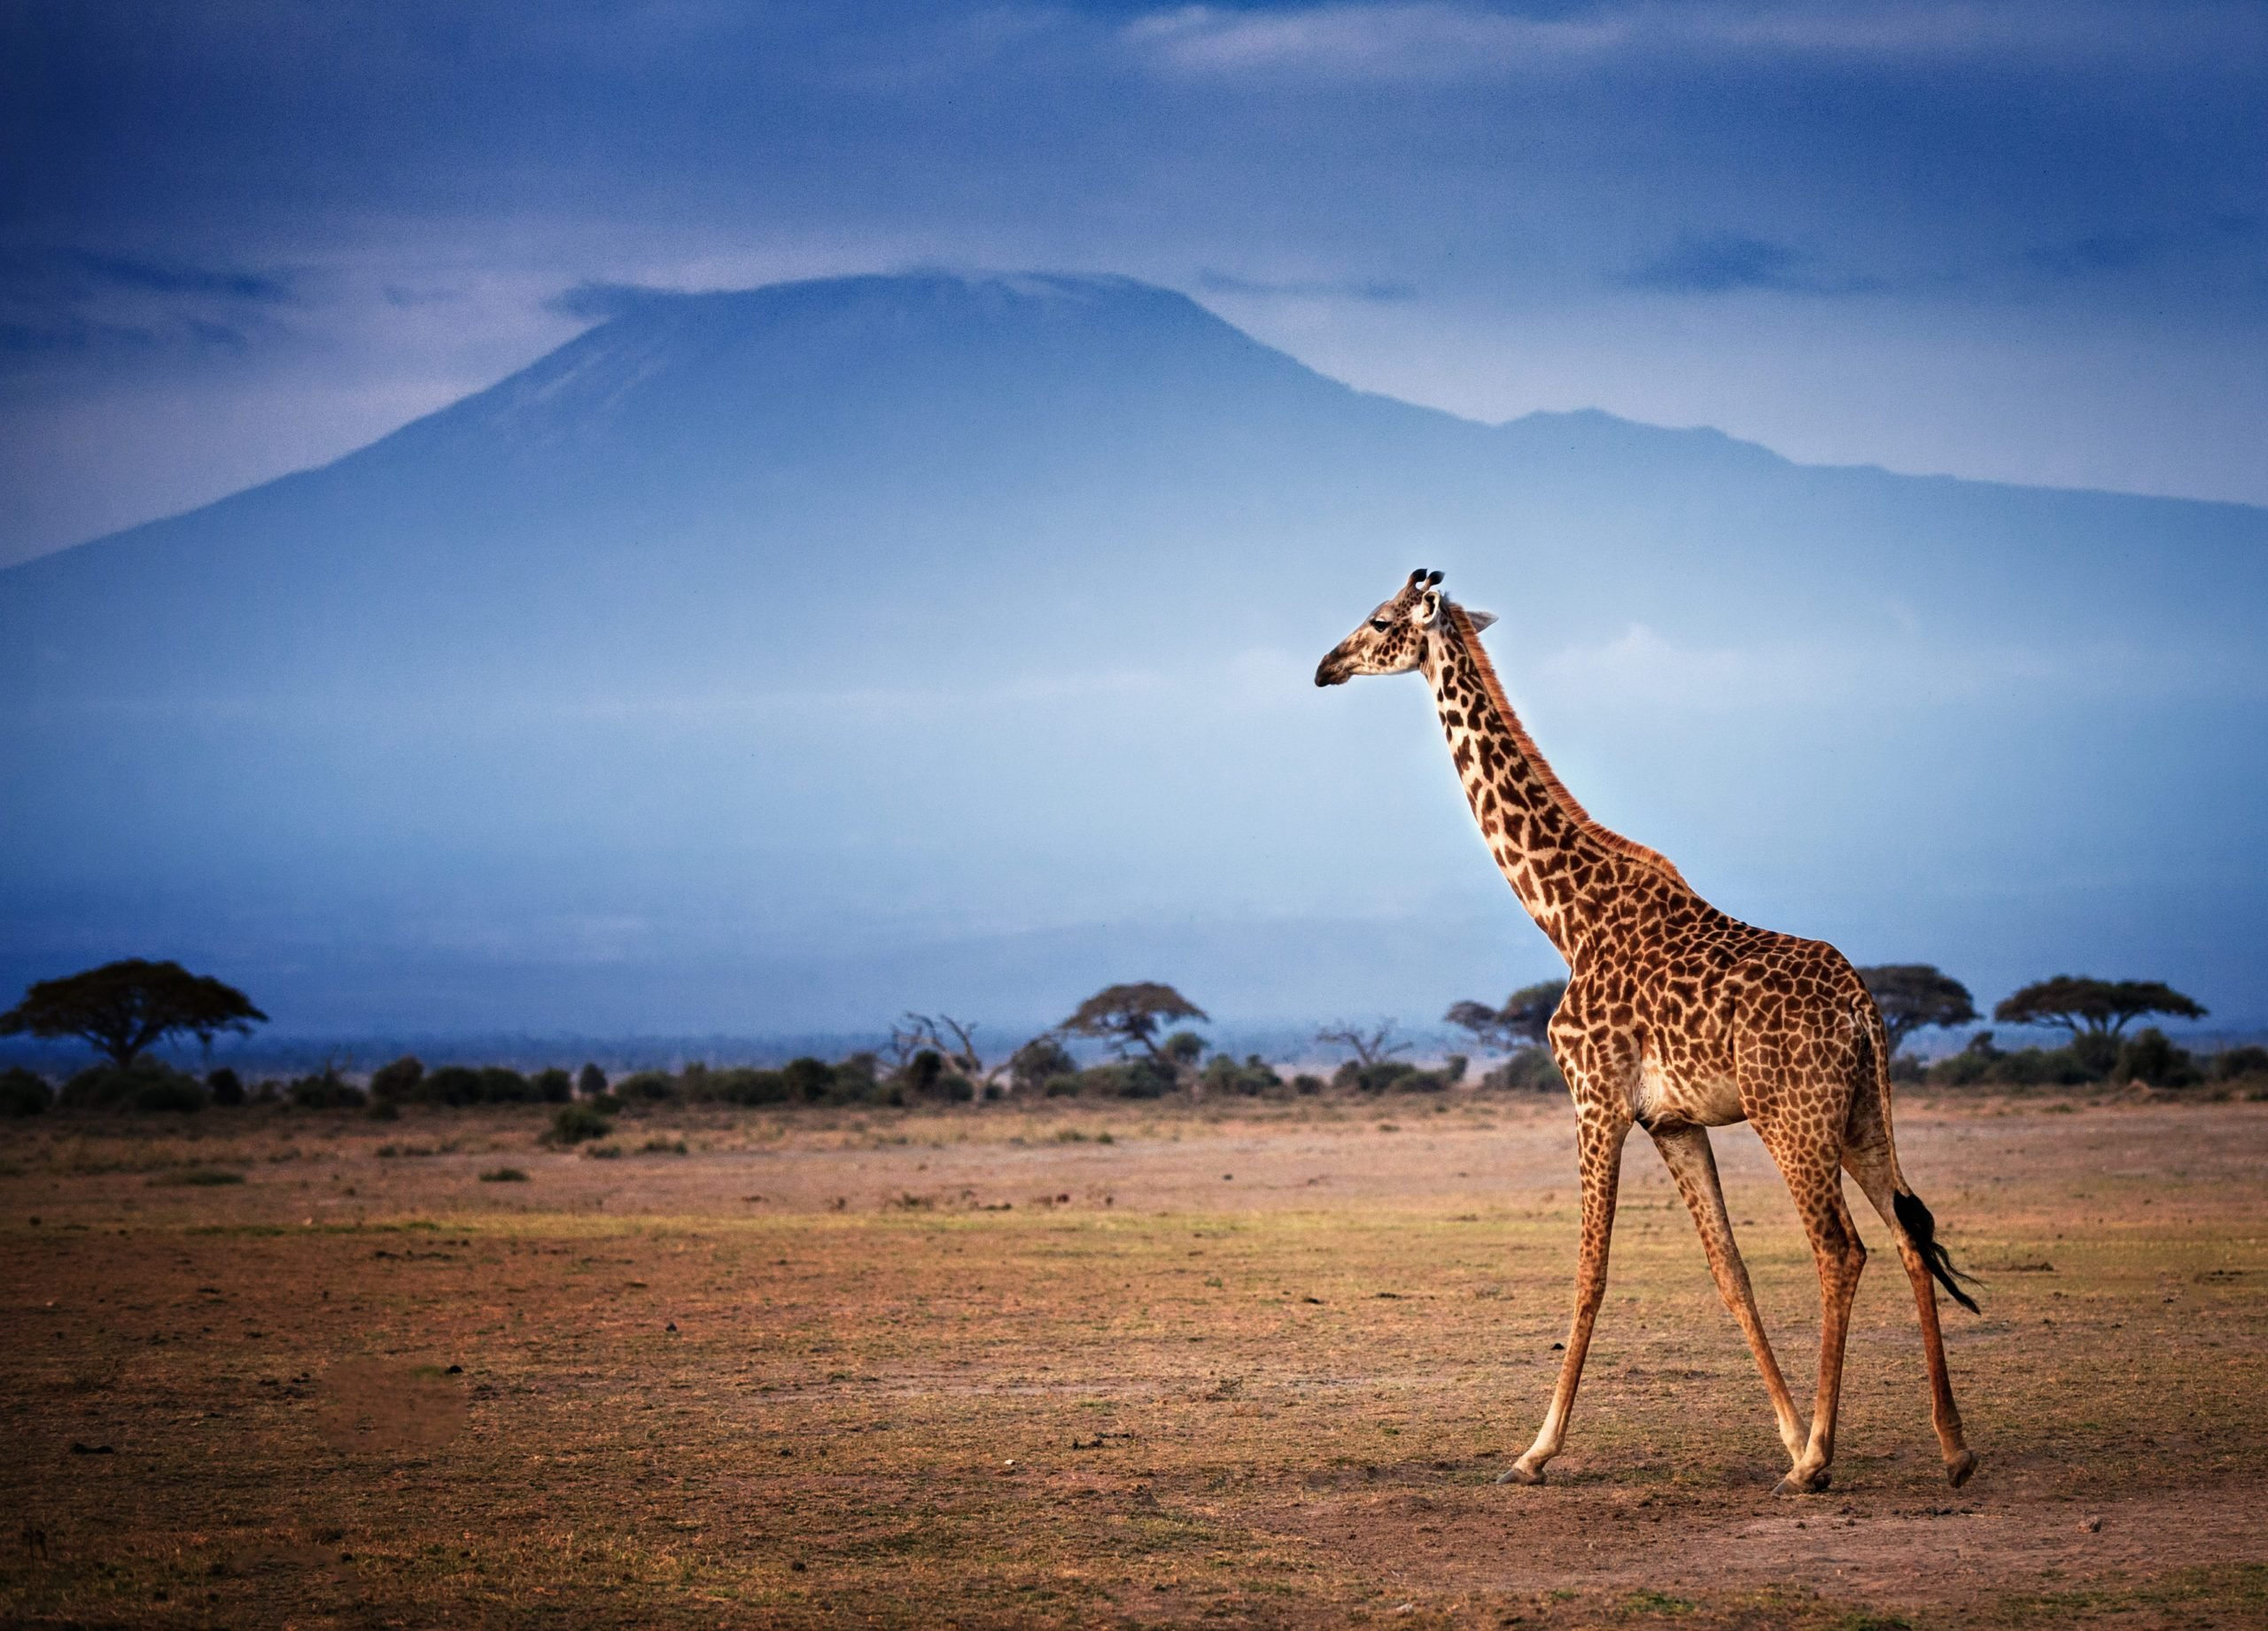 Giraffe Walking in Front of Mount Kilimanjaro in Amboseli